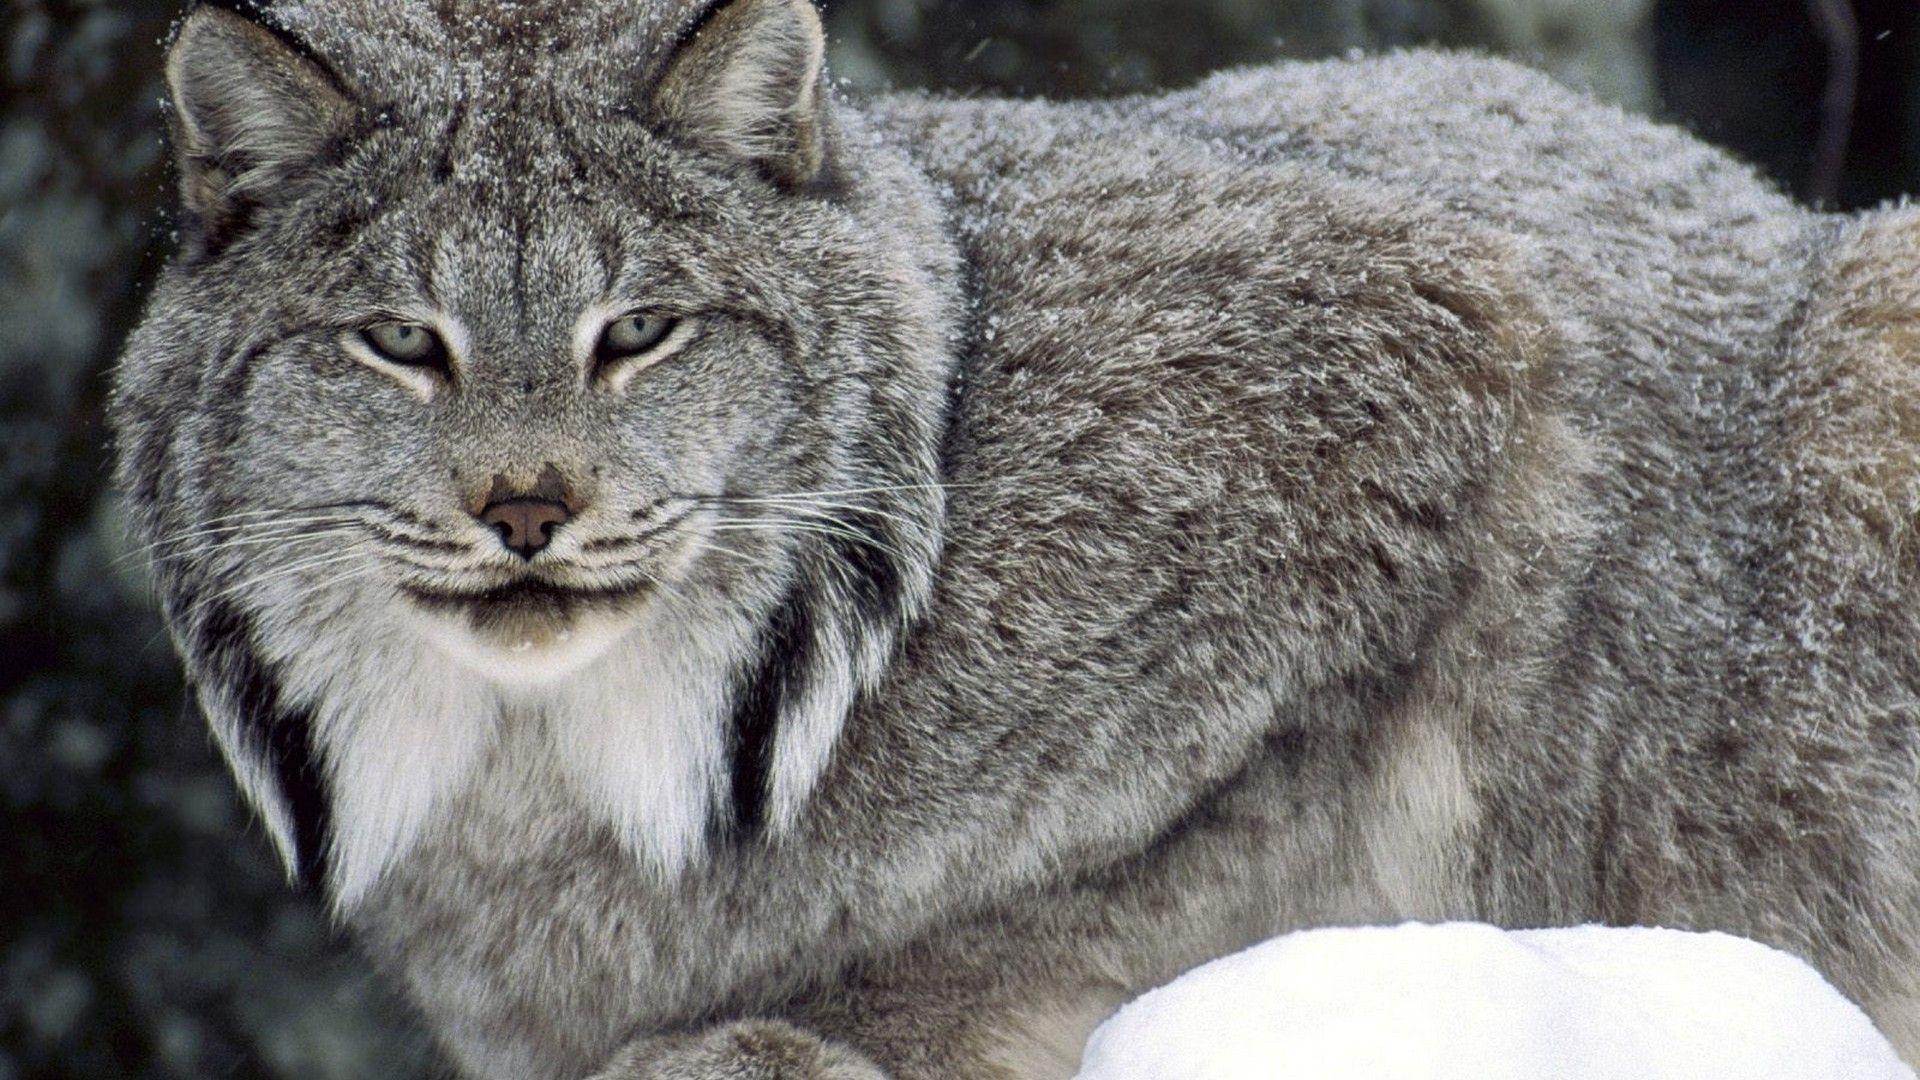 Wallpapers nature, animals, wildlife, lynx, Canada